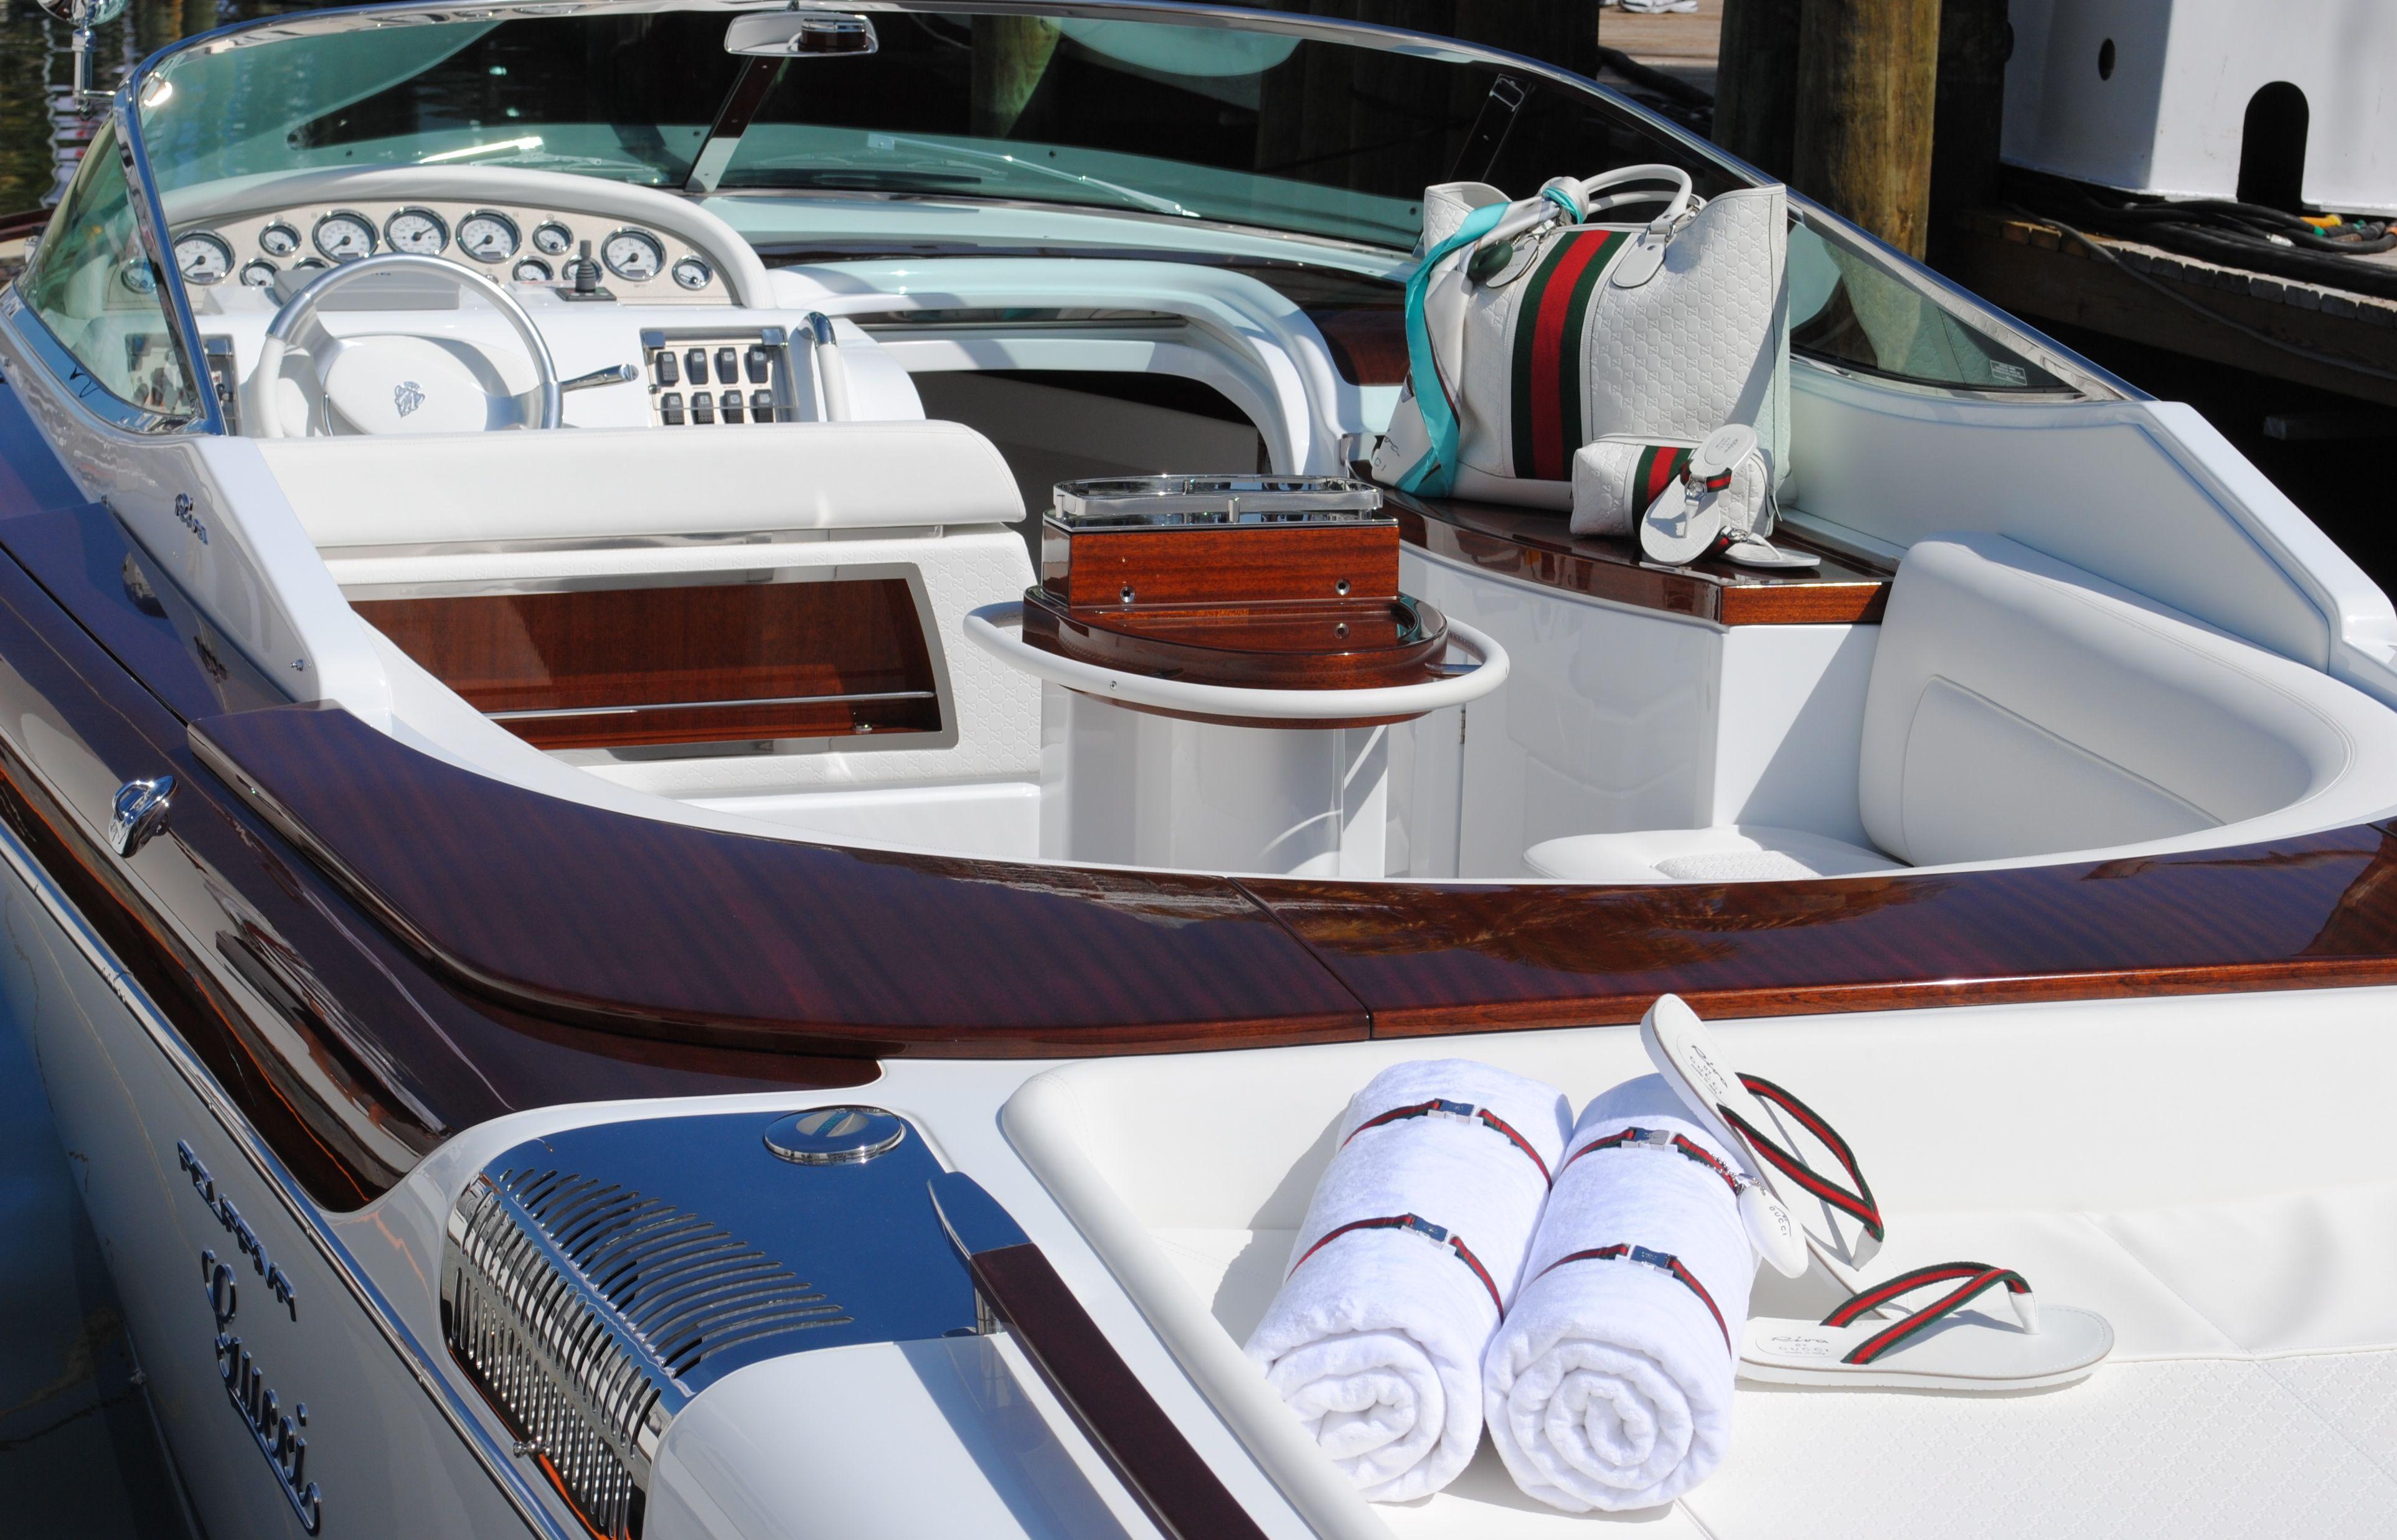 Aquariva by Gucci   Boat   Boat, Power boats, Motor boats 6d43bdb1cbb